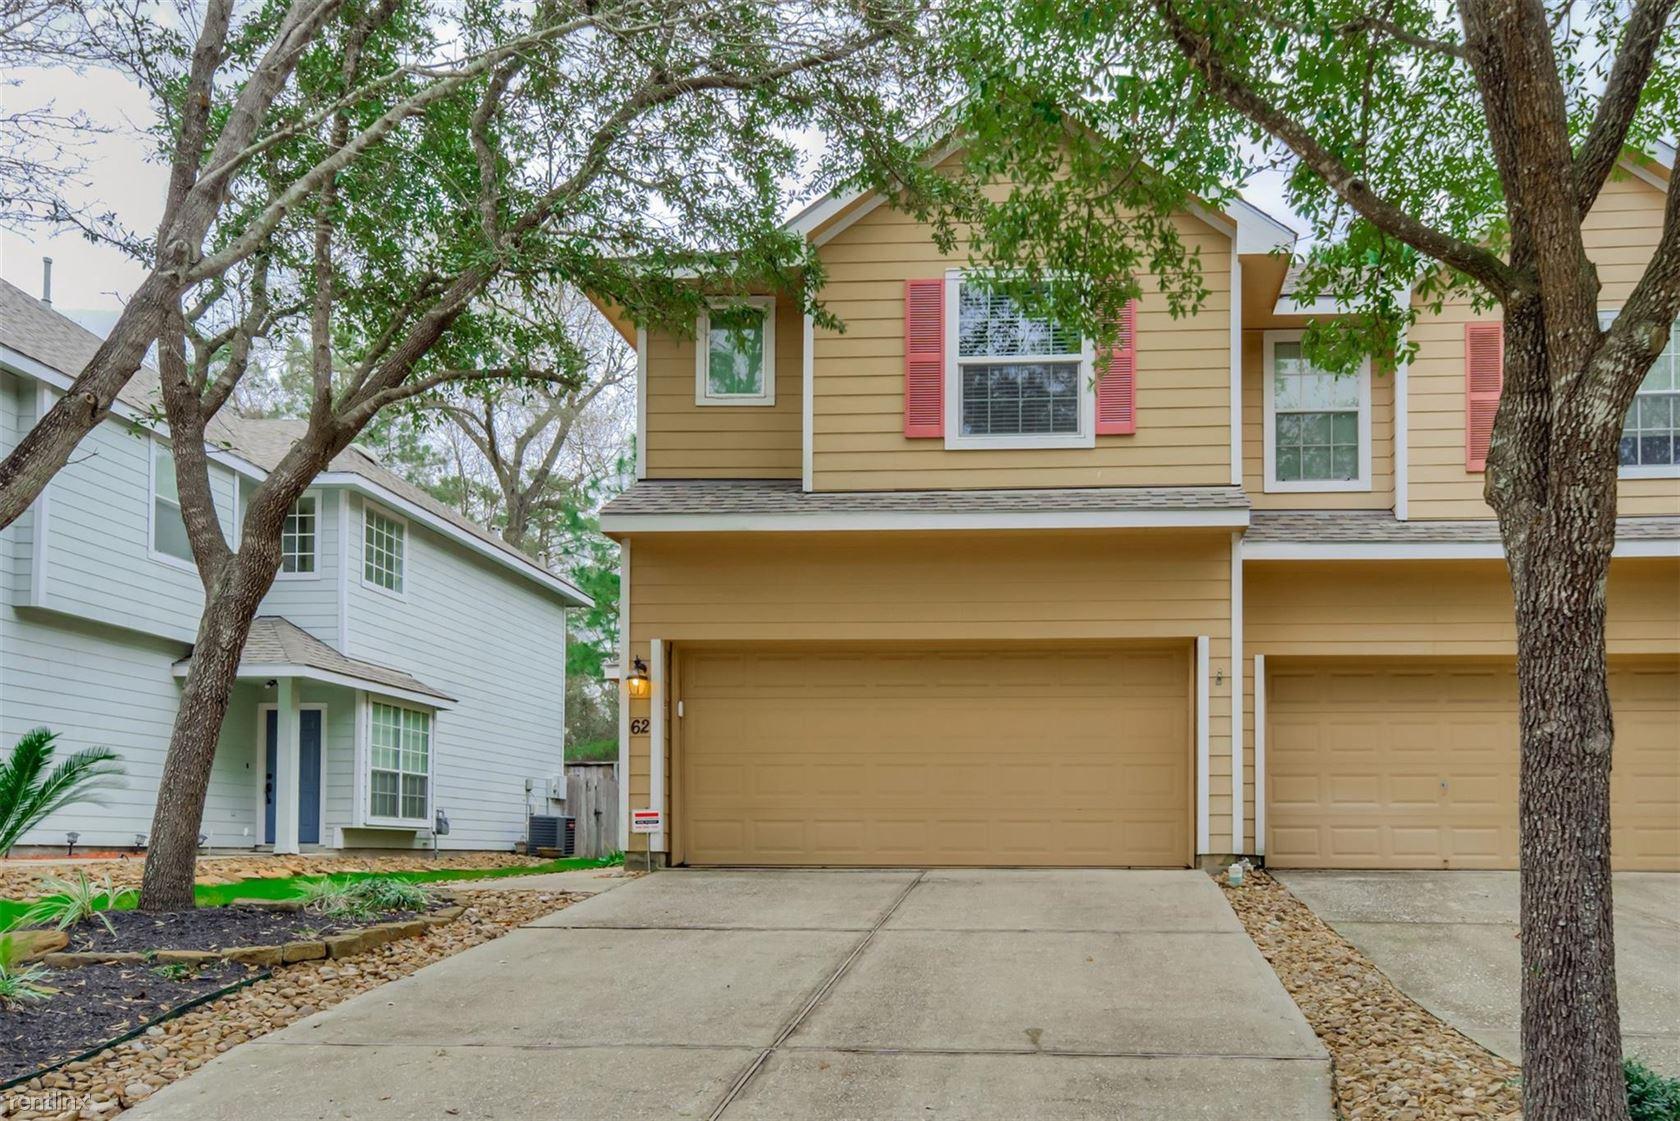 62 S Camellia Grove Cir, THE WOODLANDS, TX - $1,700